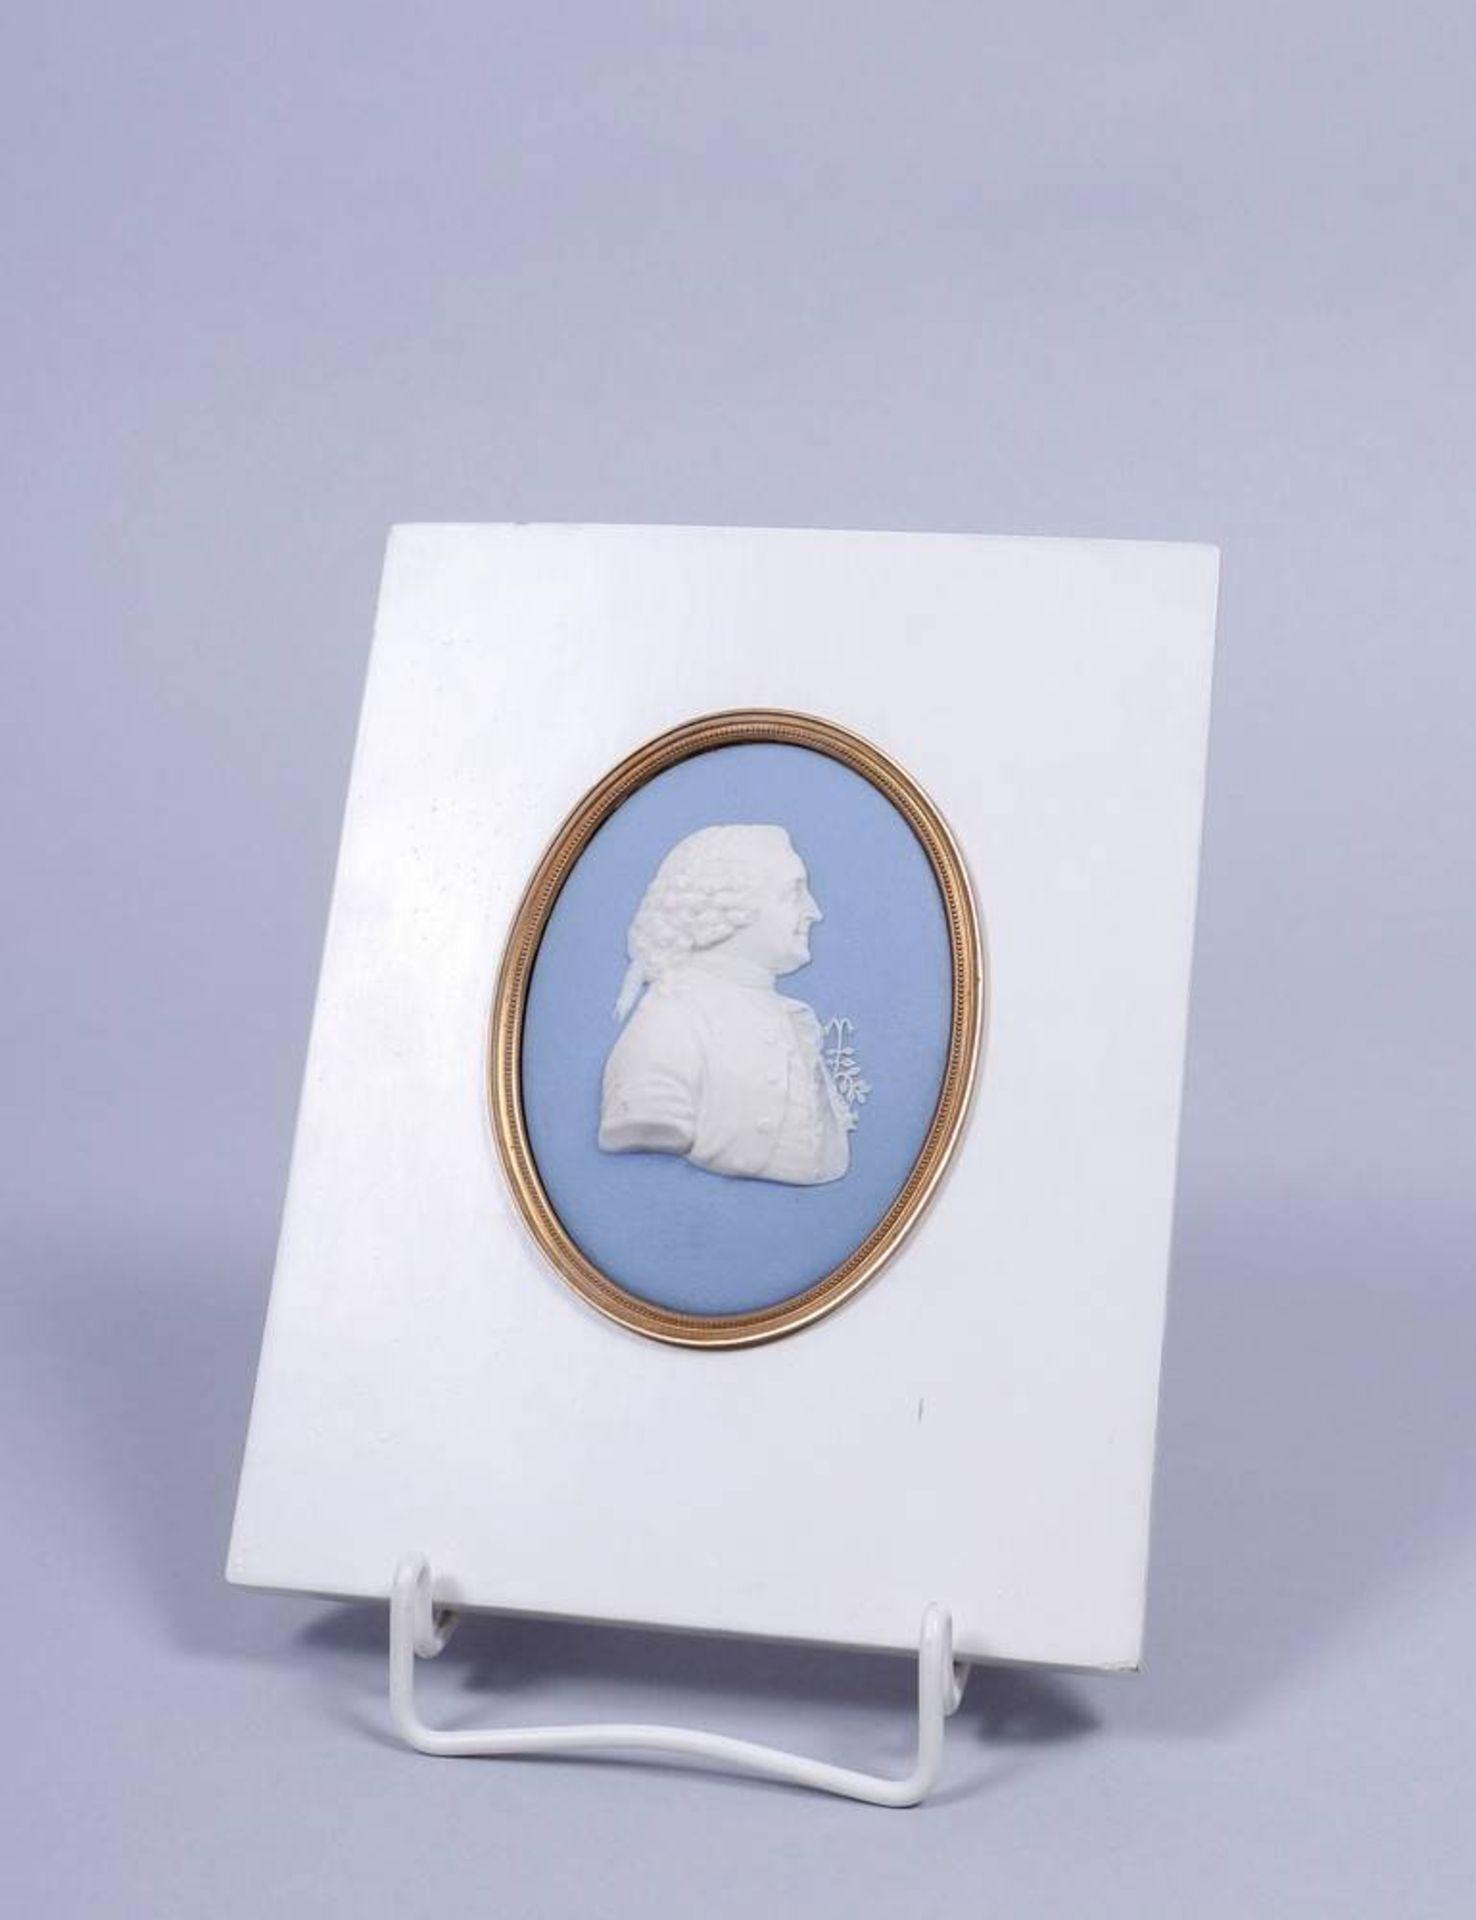 Portrait-Medaillon von Carl von Linné (1707, Råshult - 1778, Uppsala), Wedgwood, um 1800 sog.